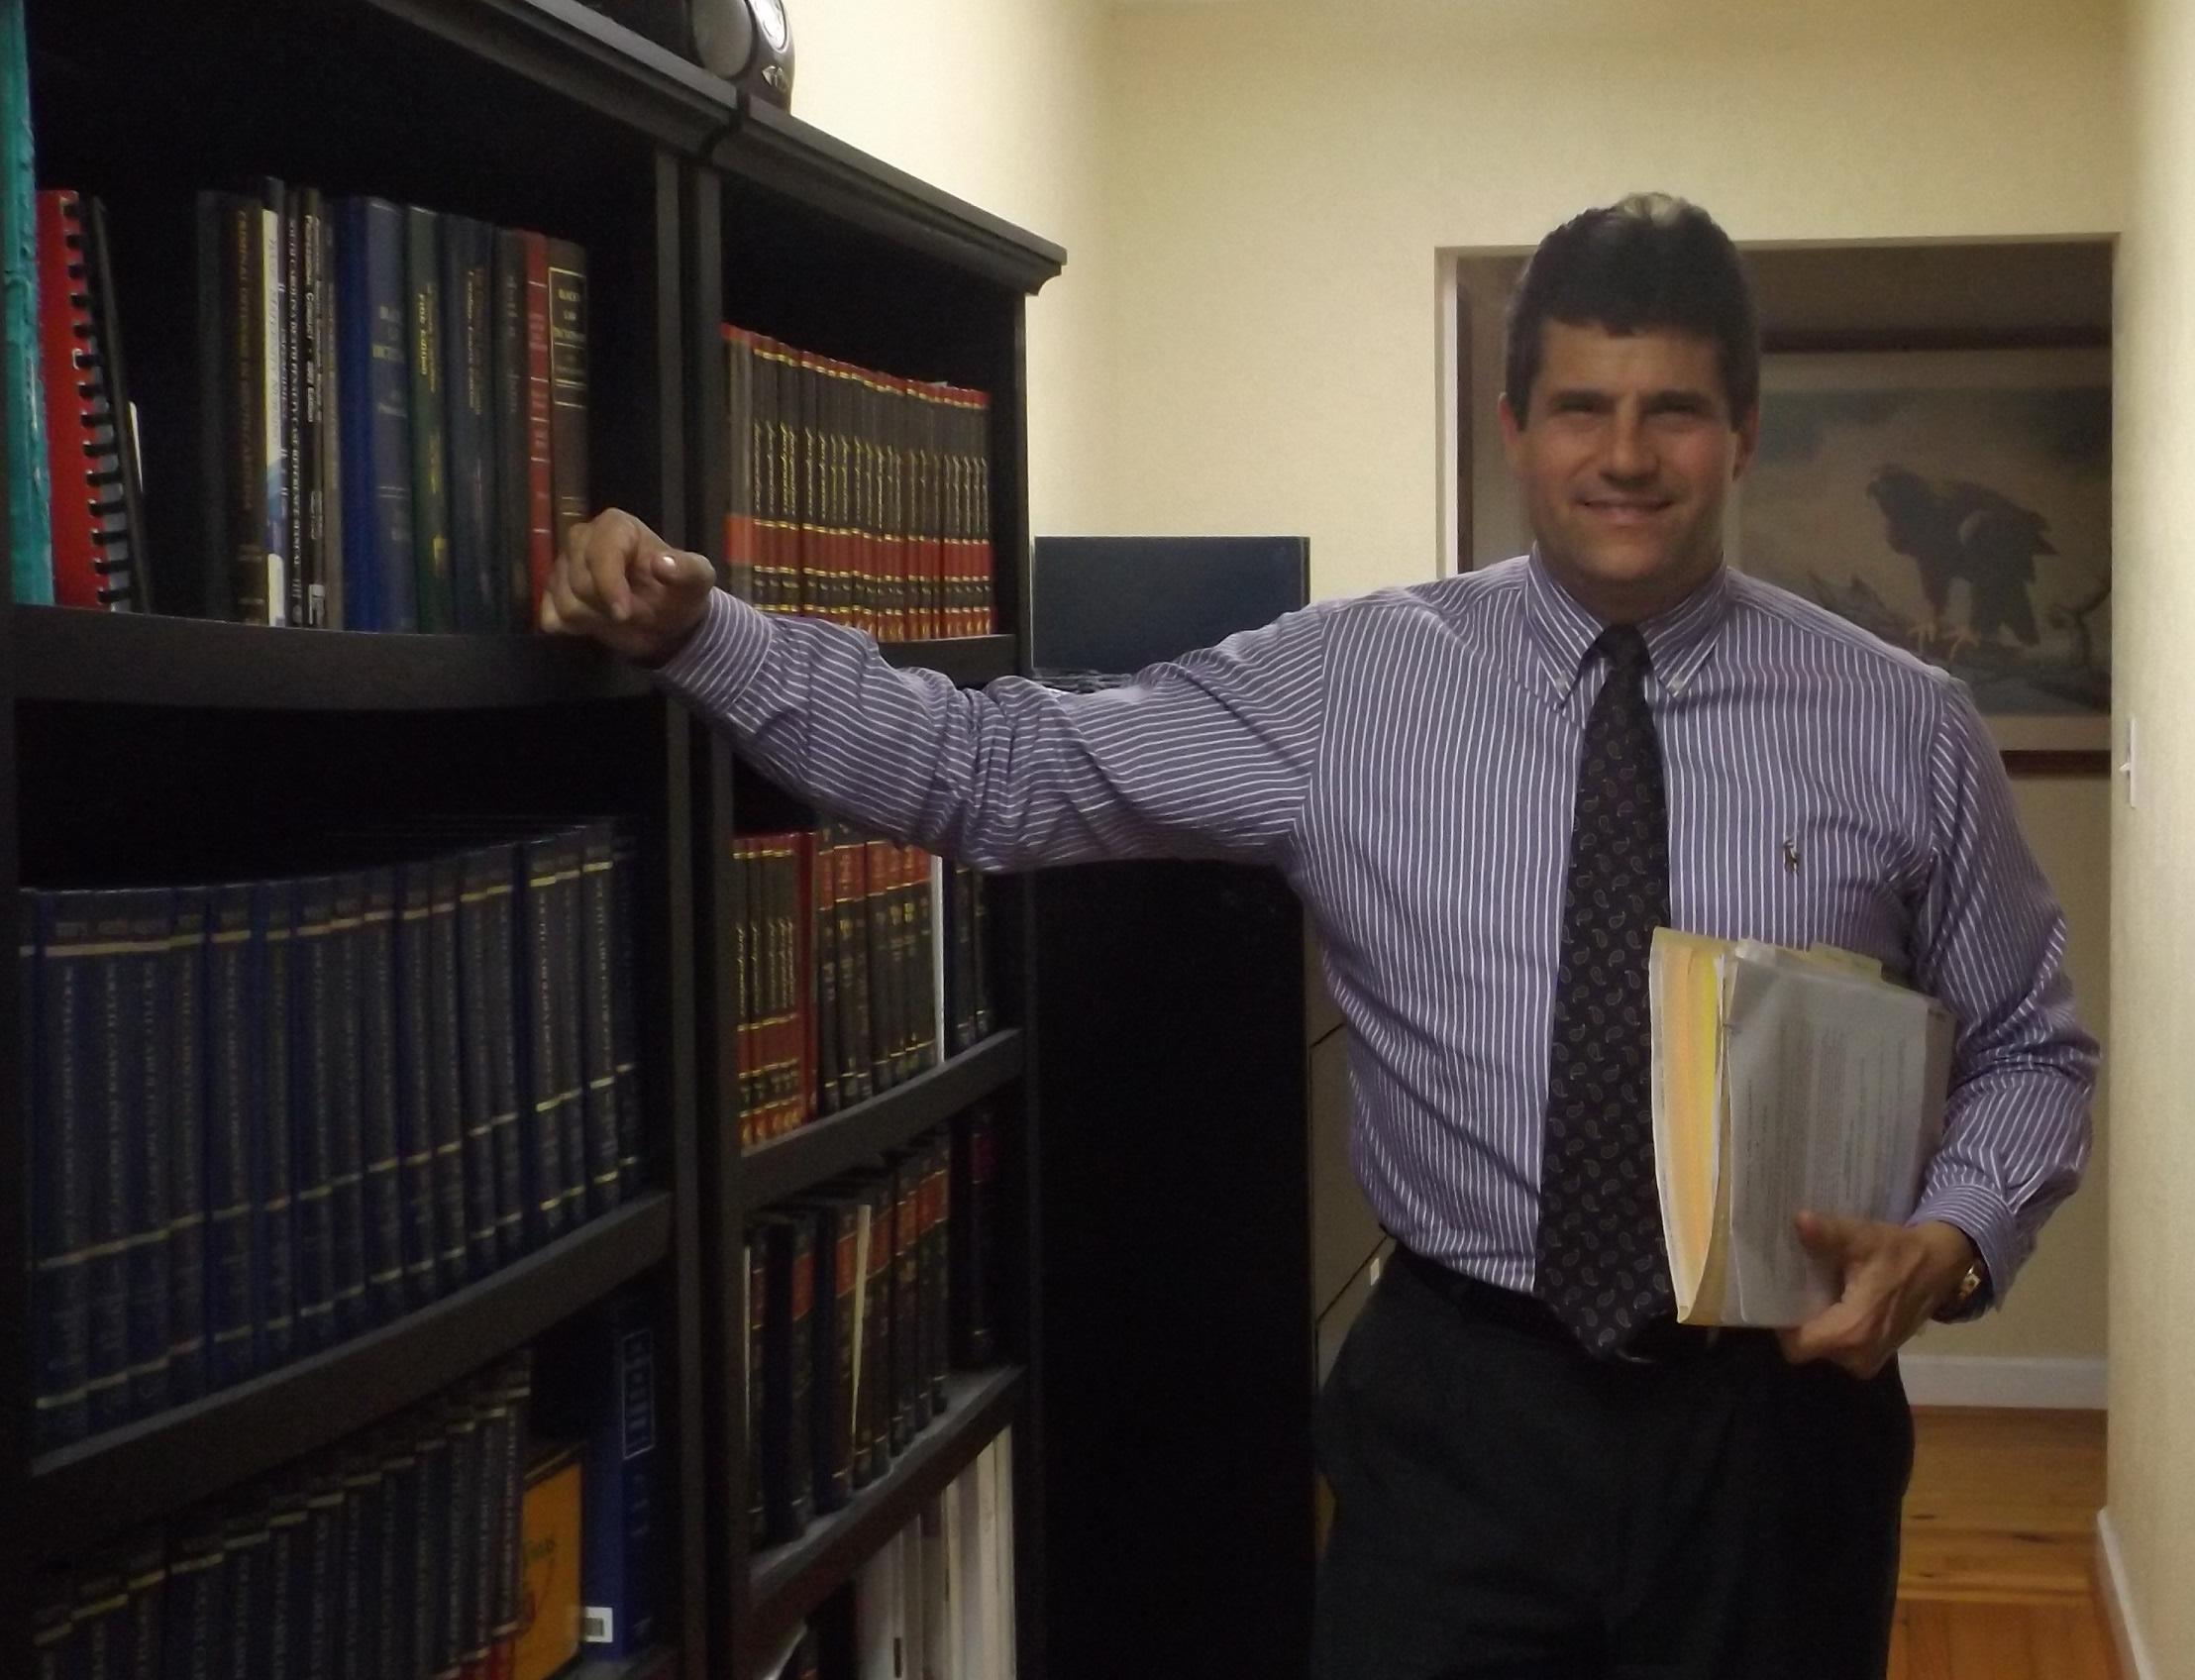 Criminal defense attorney Richard Gustafson